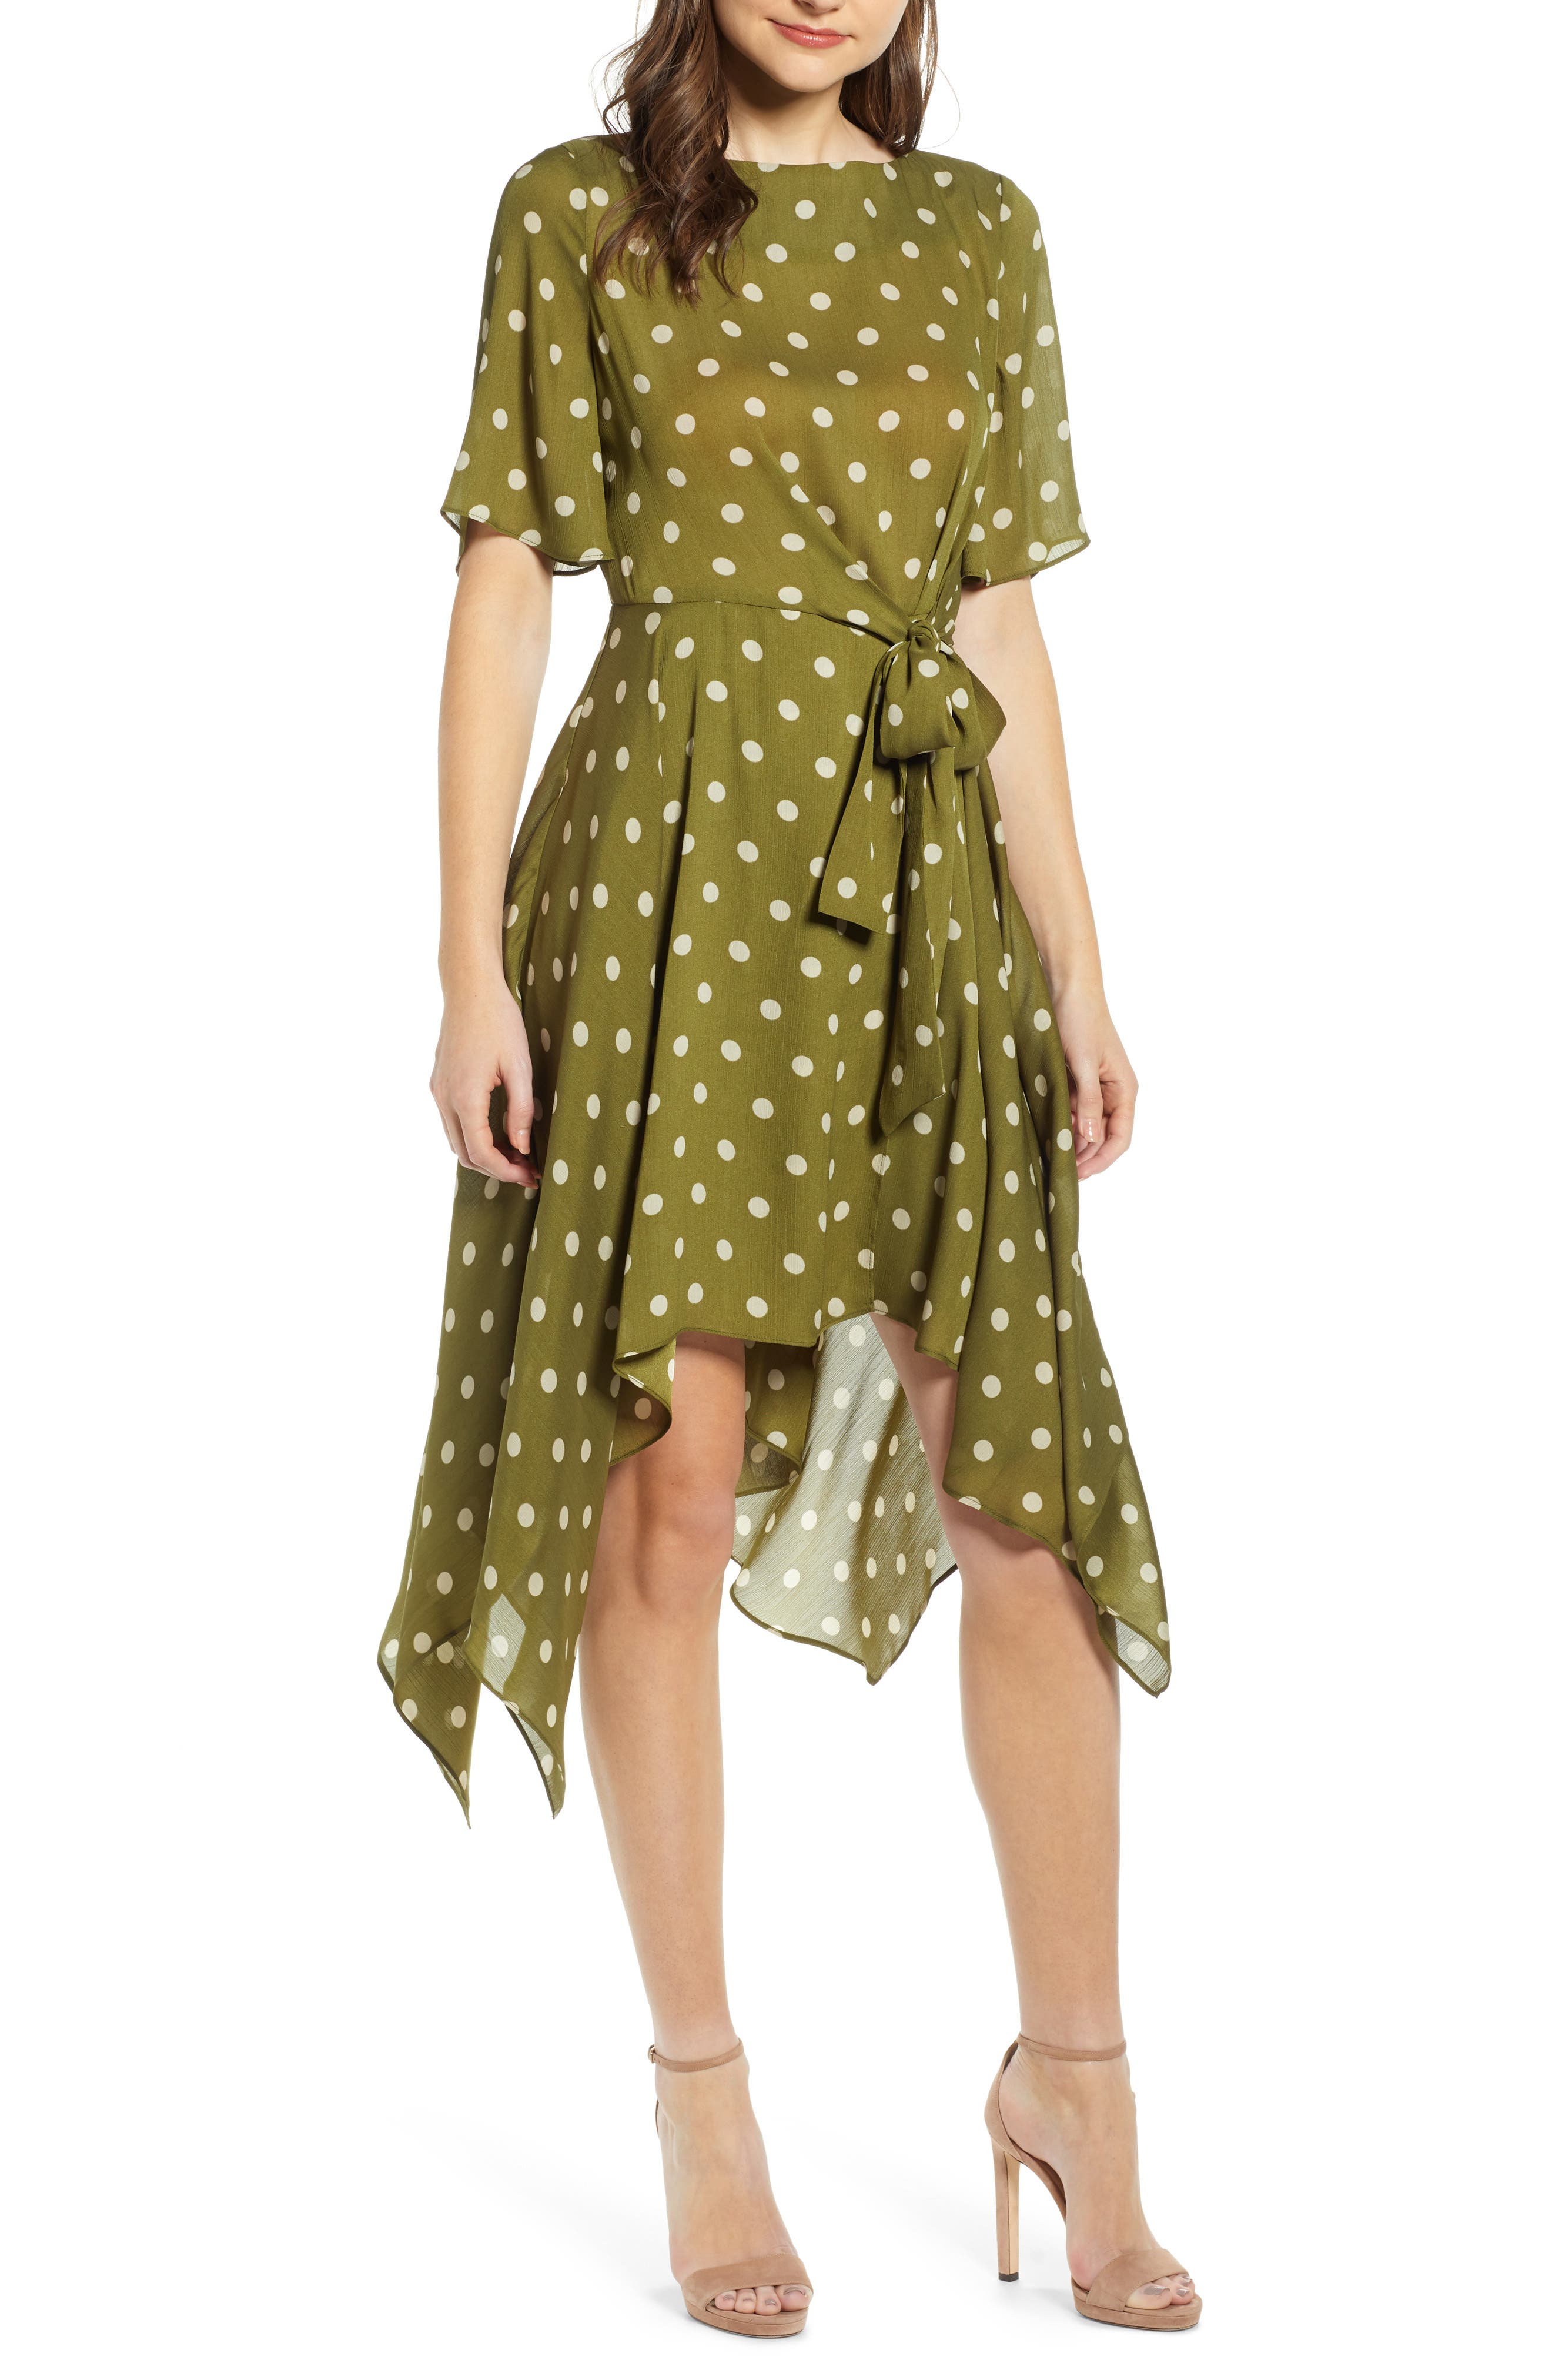 Chriselle Lim Marie Handkerchief Hem Midi Dress, Main, color, 900